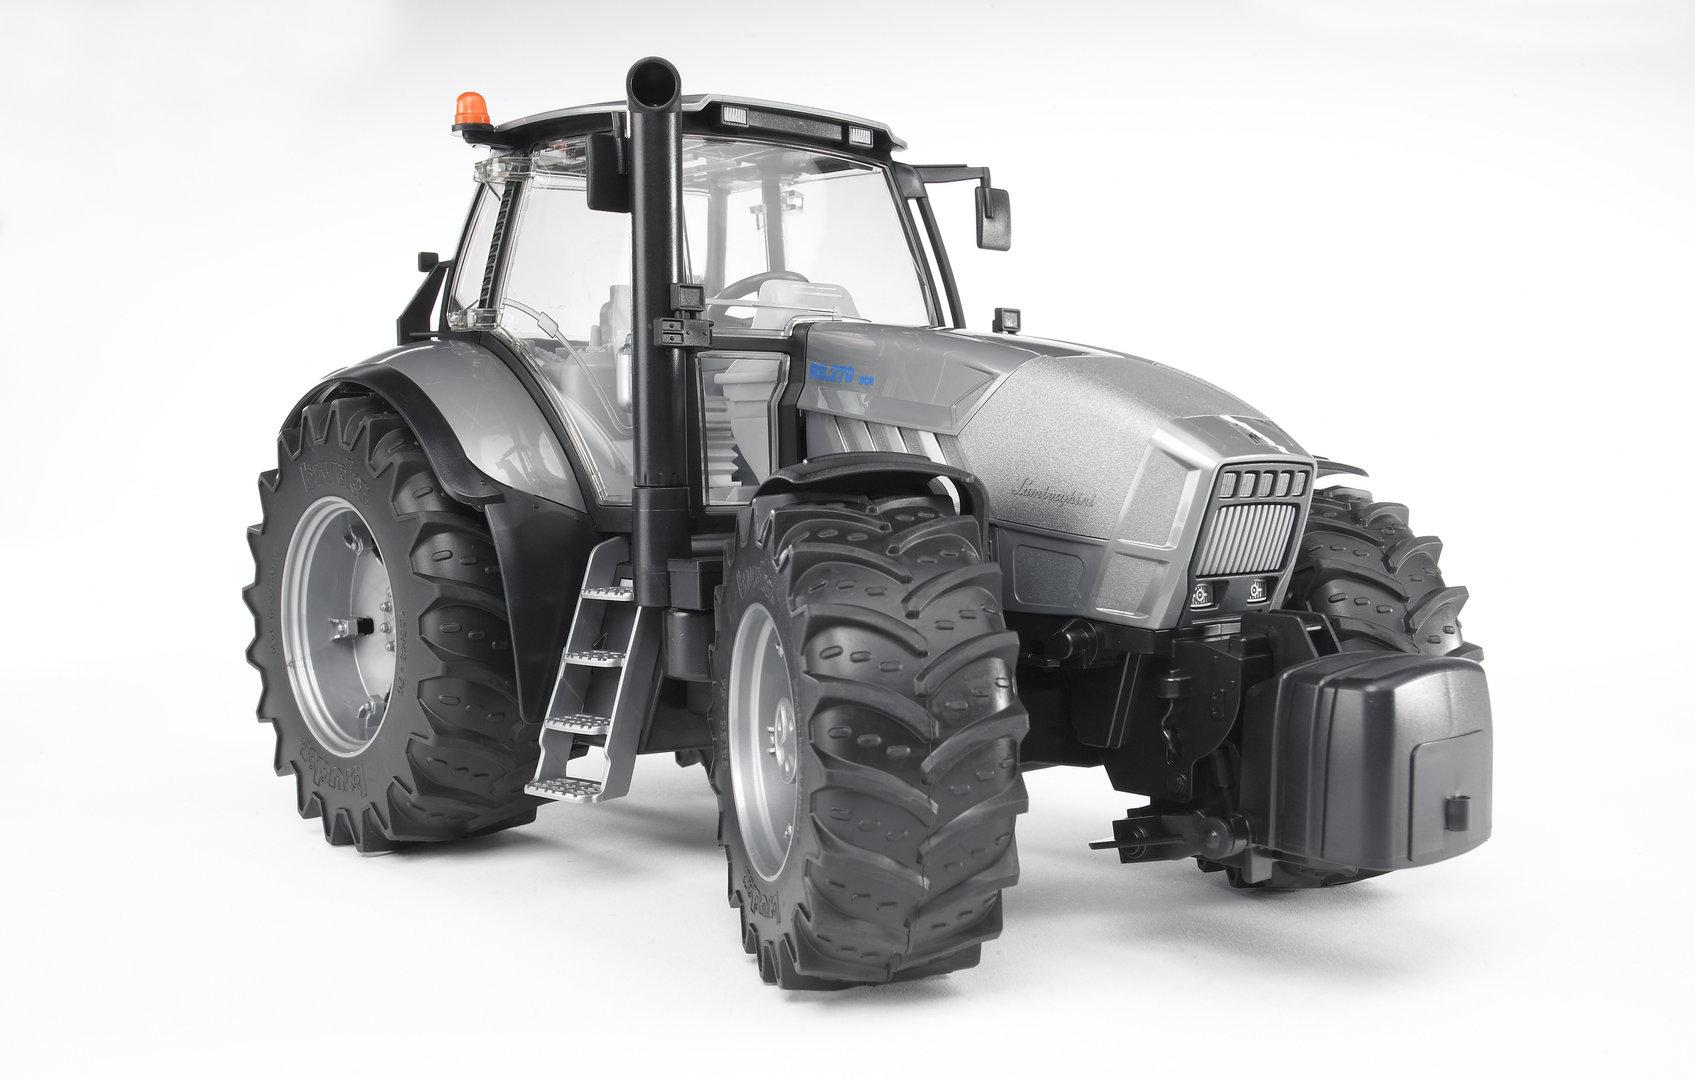 lamborghini dcr bruder lamborghini spielzeug traktor. Black Bedroom Furniture Sets. Home Design Ideas